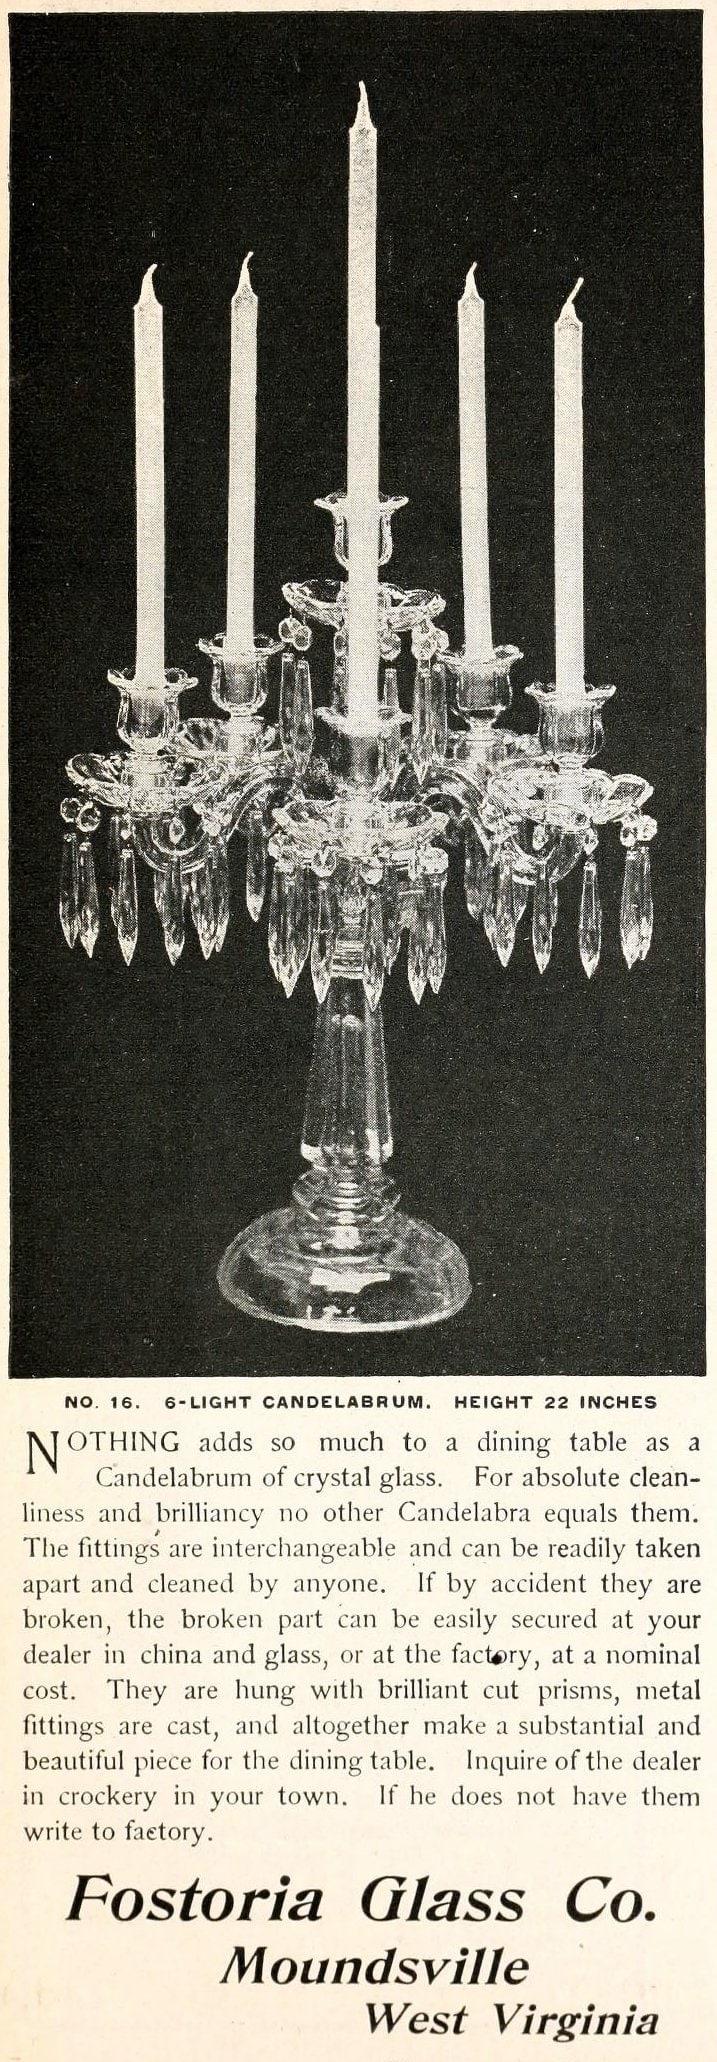 Antique Fostoria Glass from 1896 - Candelabrum